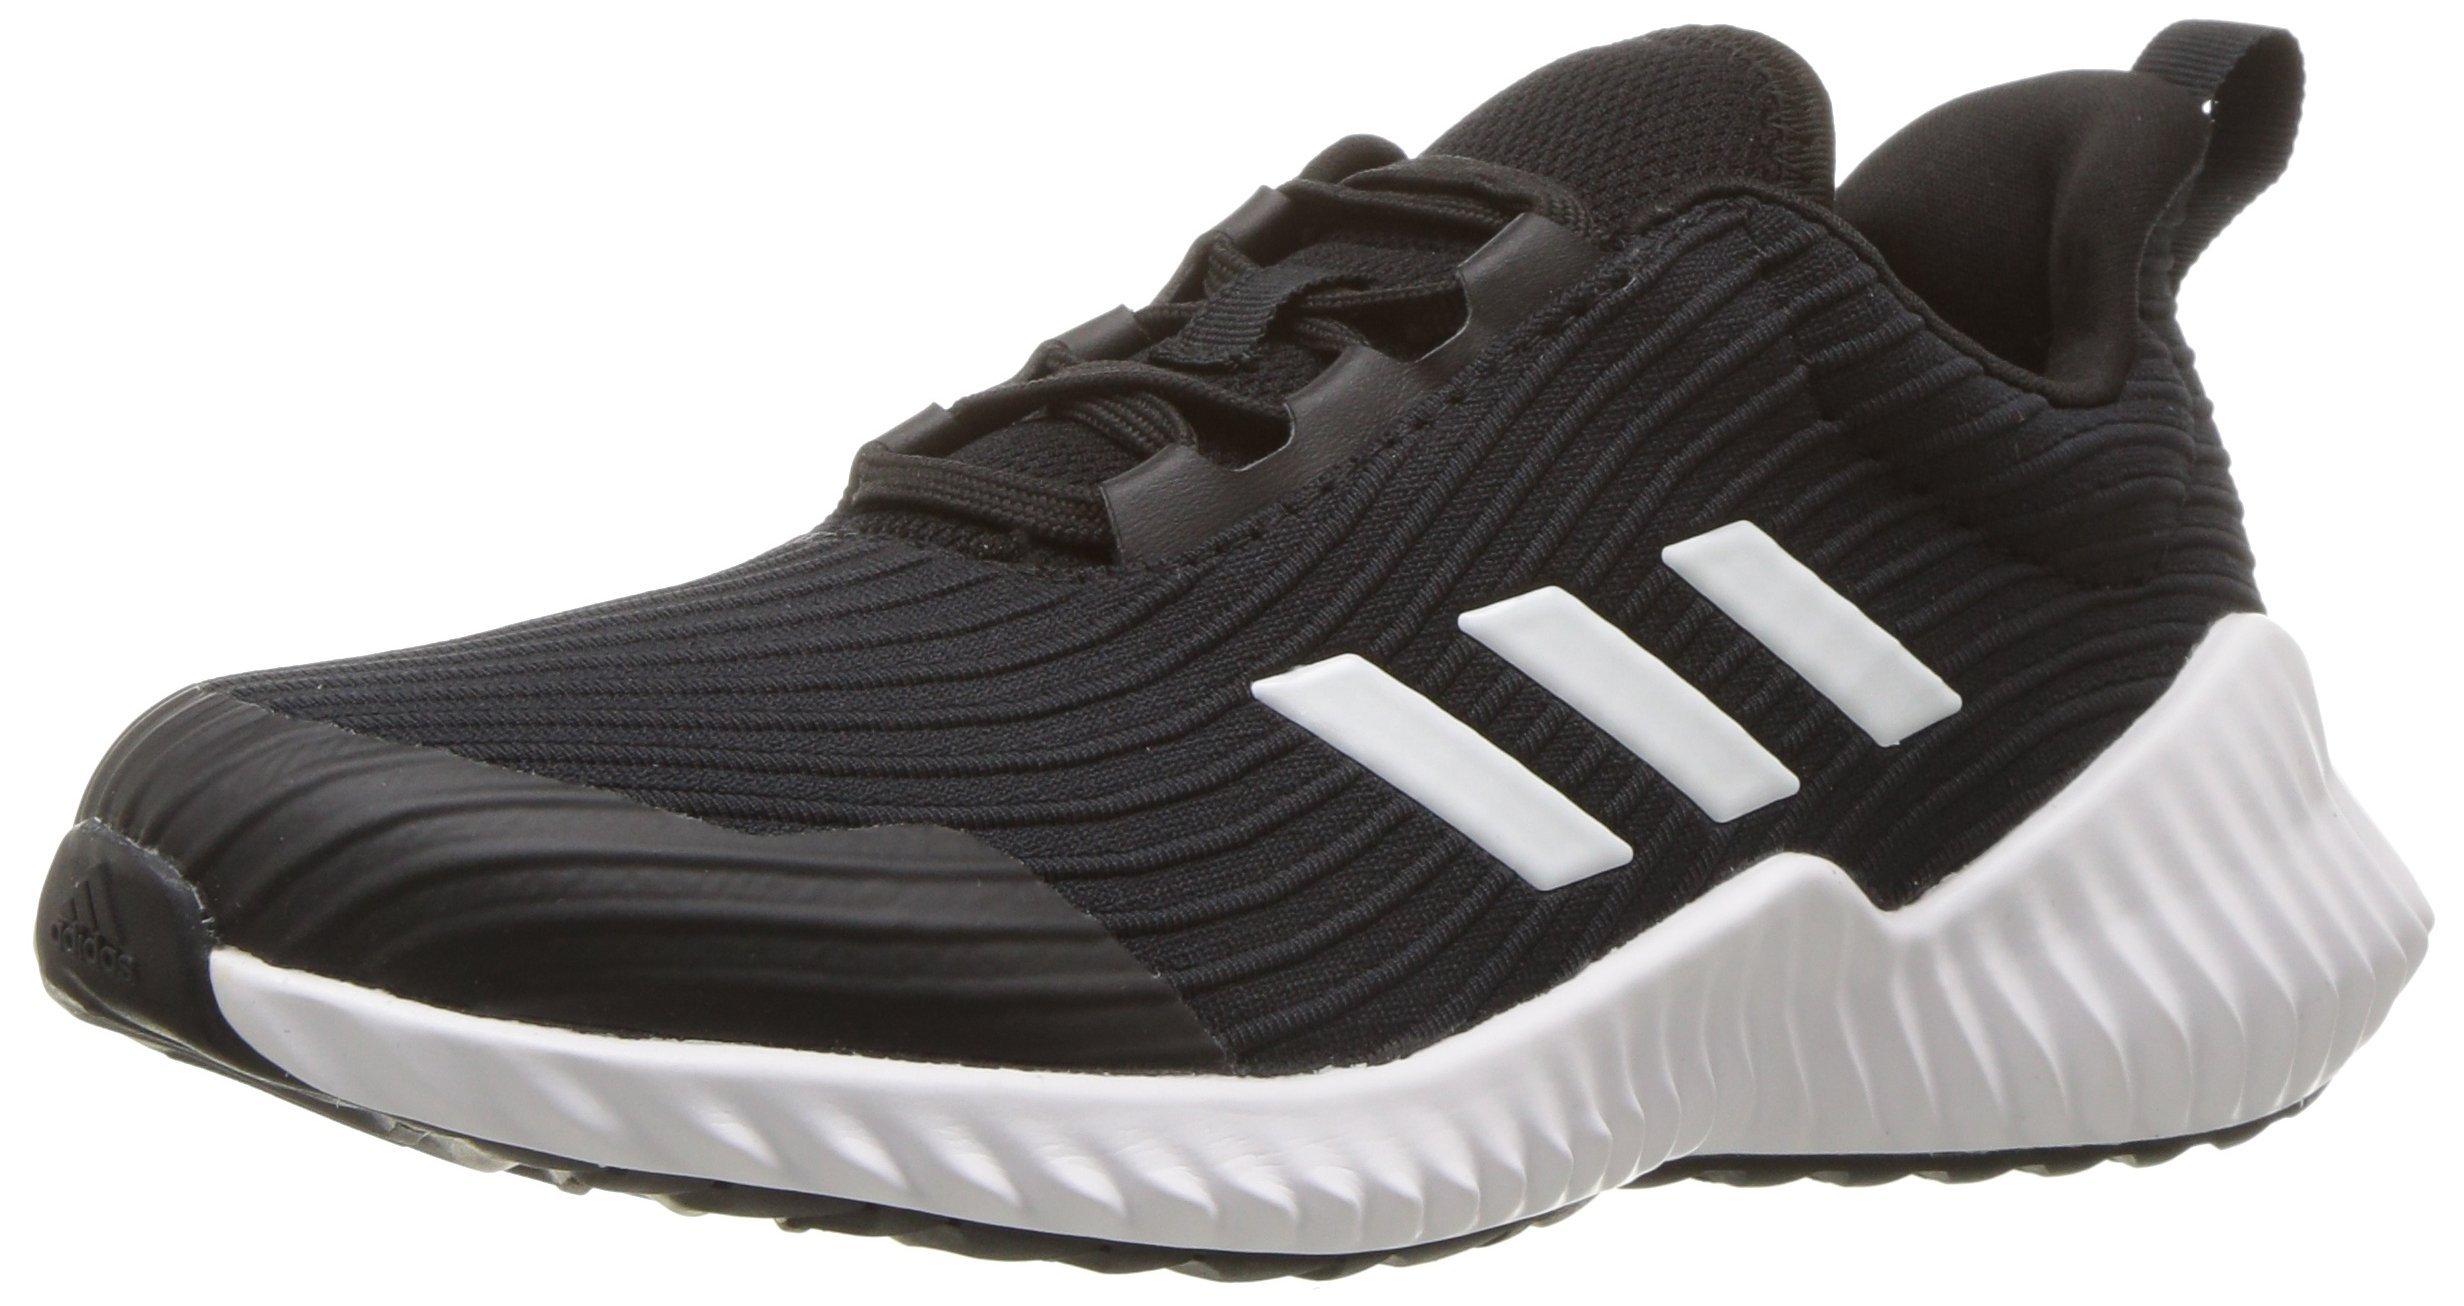 pretty nice 966e7 3075c Galleon - Adidas Originals Unisex-Kids Fortarun Running Shoe,  Black White Black, 13.5K M US Little Kid